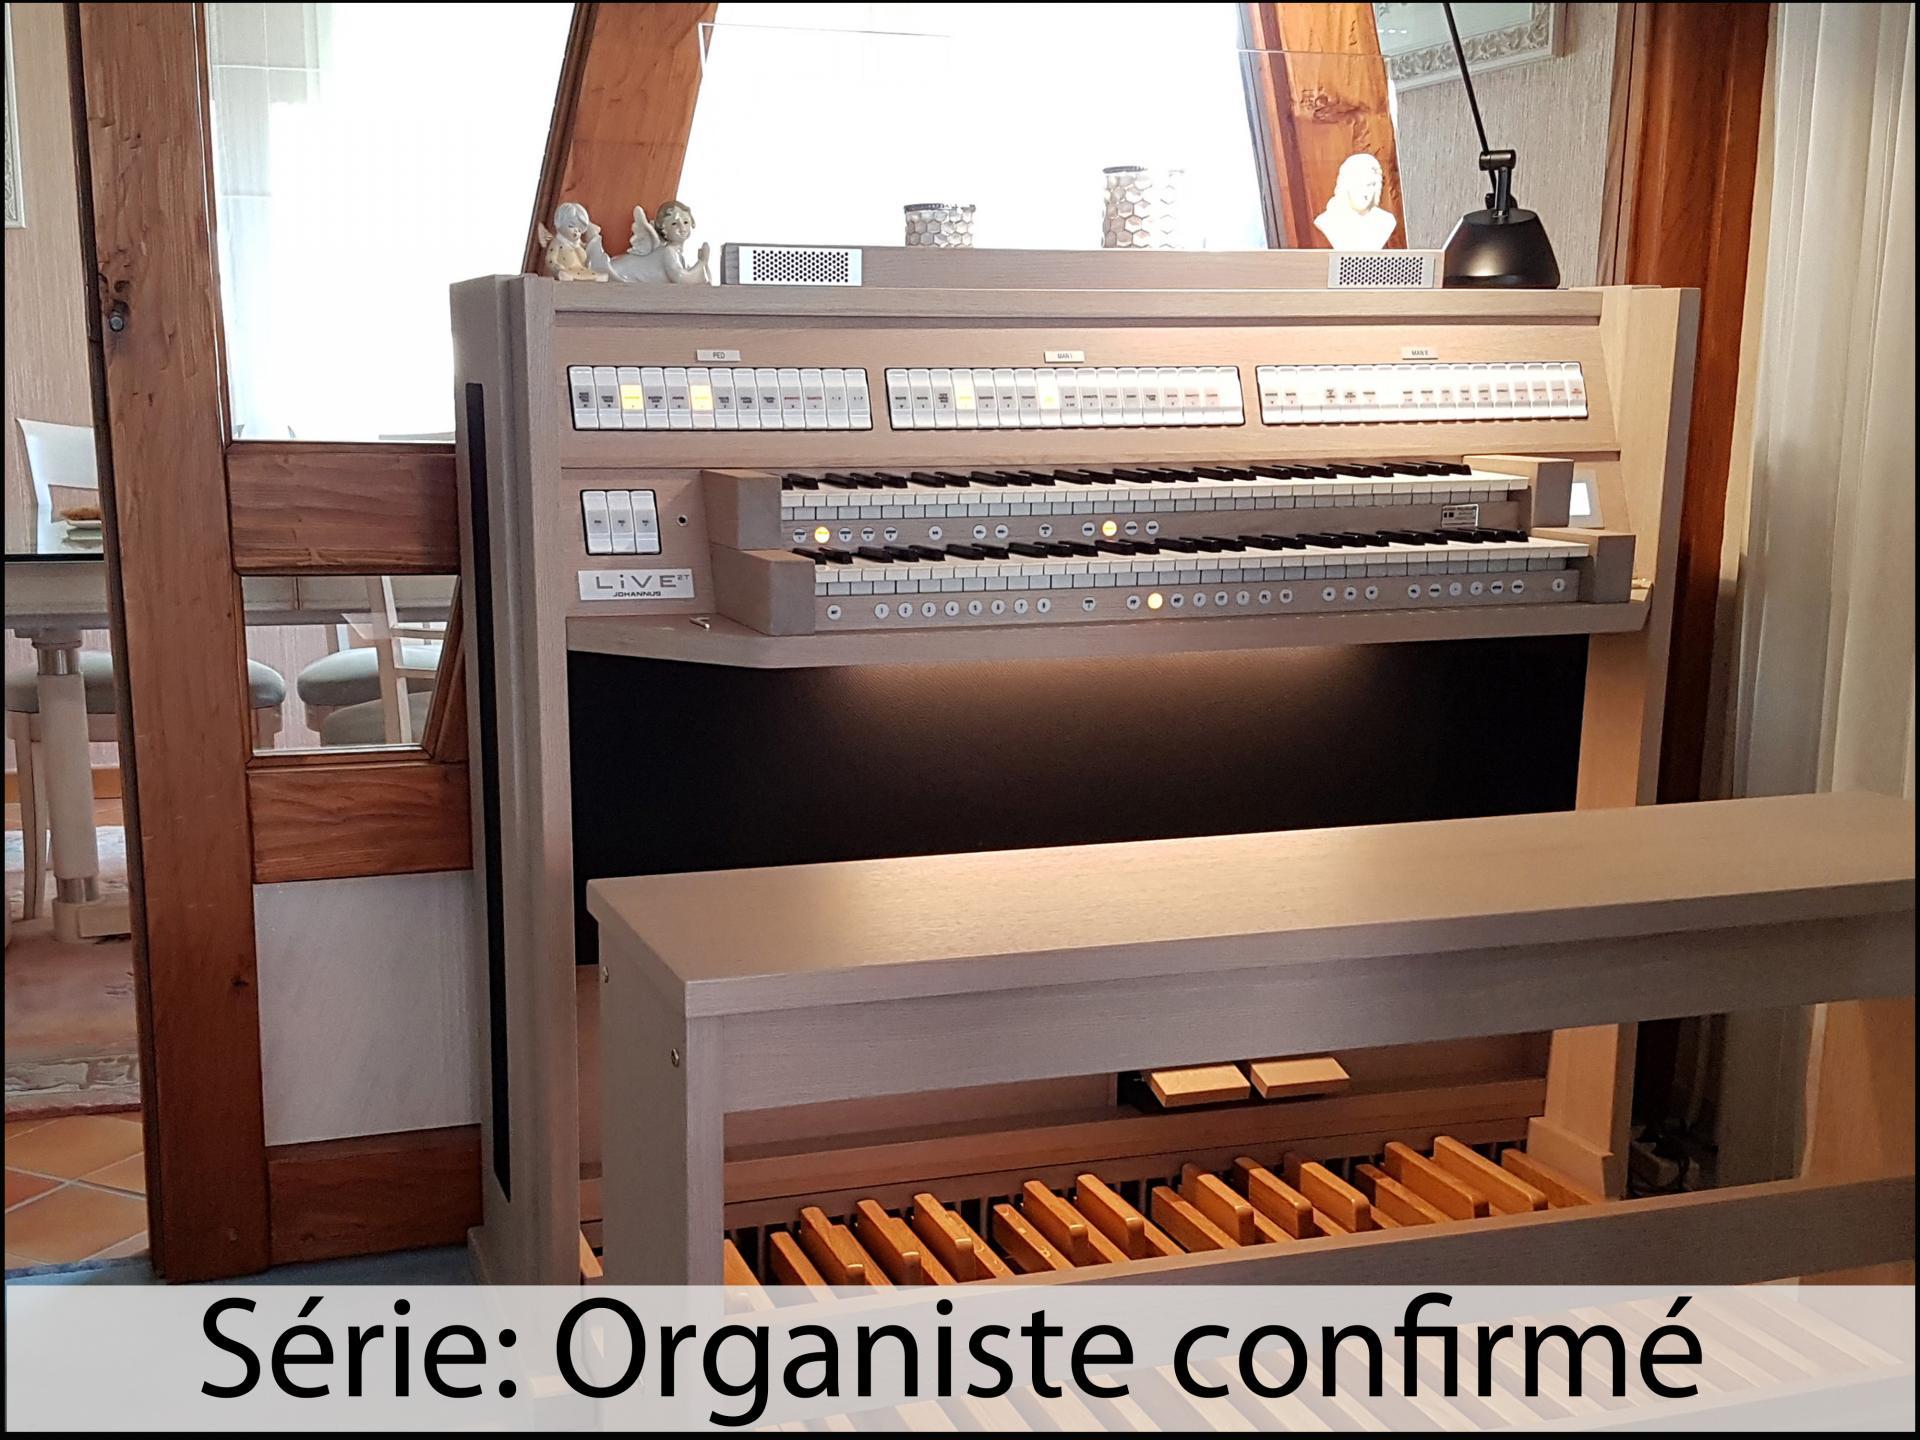 Carre organiste confirme 1